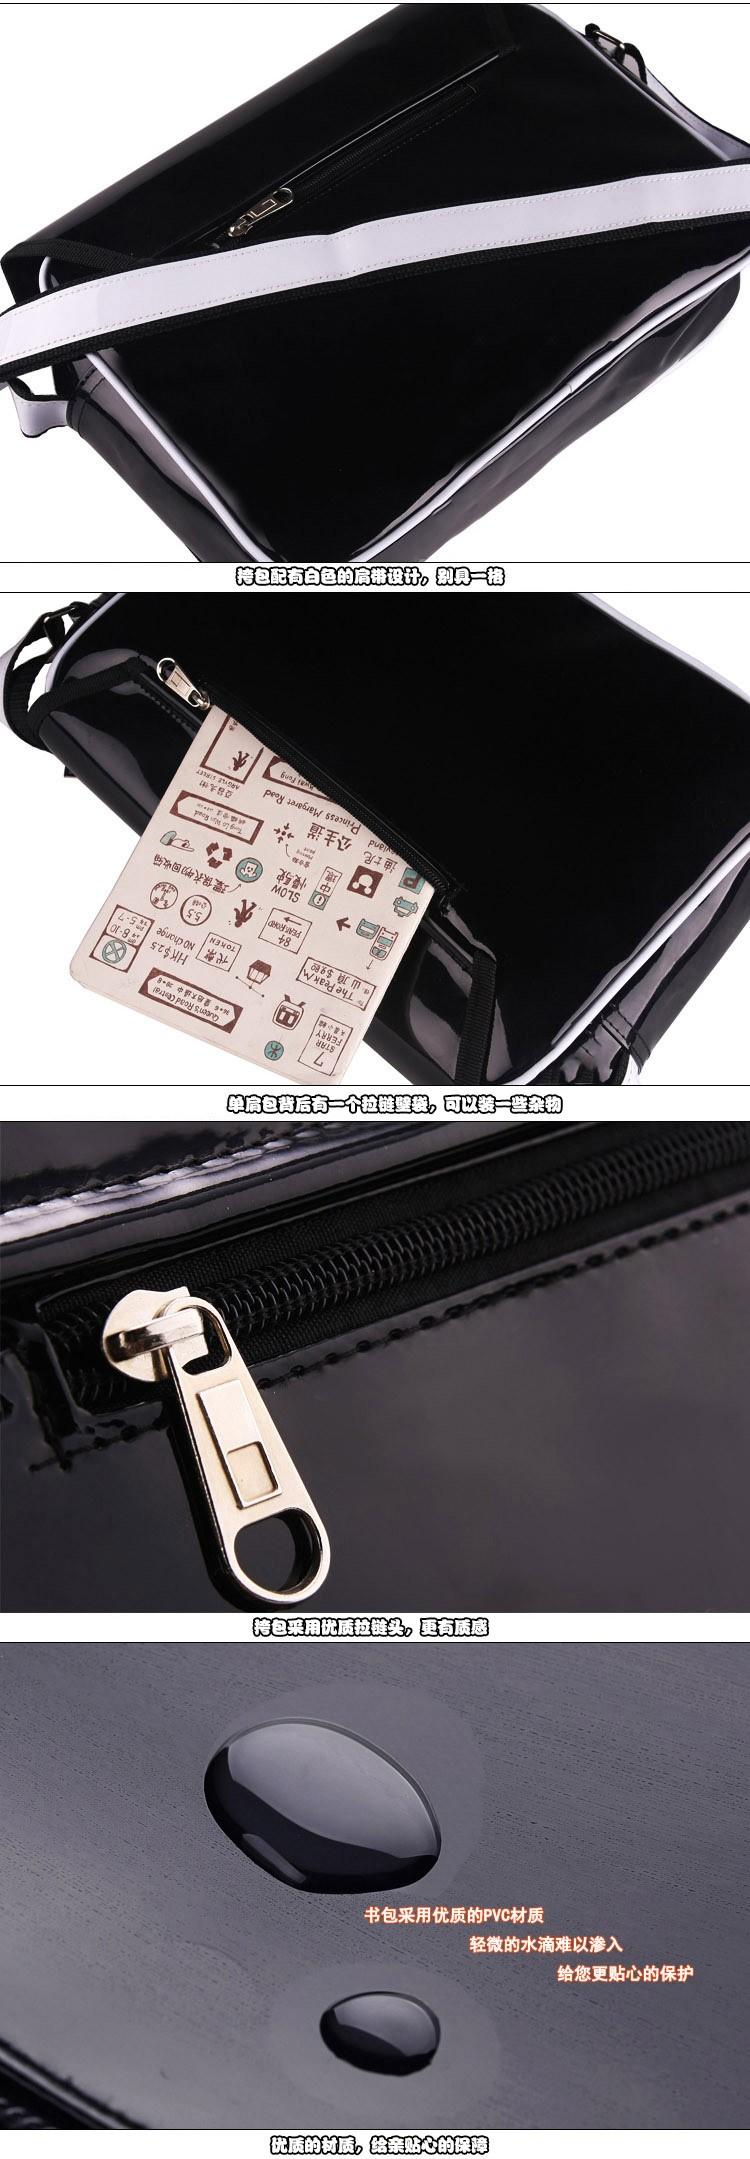 Hetalia Shoulder Bag Axis Powers Hetalia Cosplay Messenger Bags Unisex patent leather Satchel Cartoon APH Schoolbag